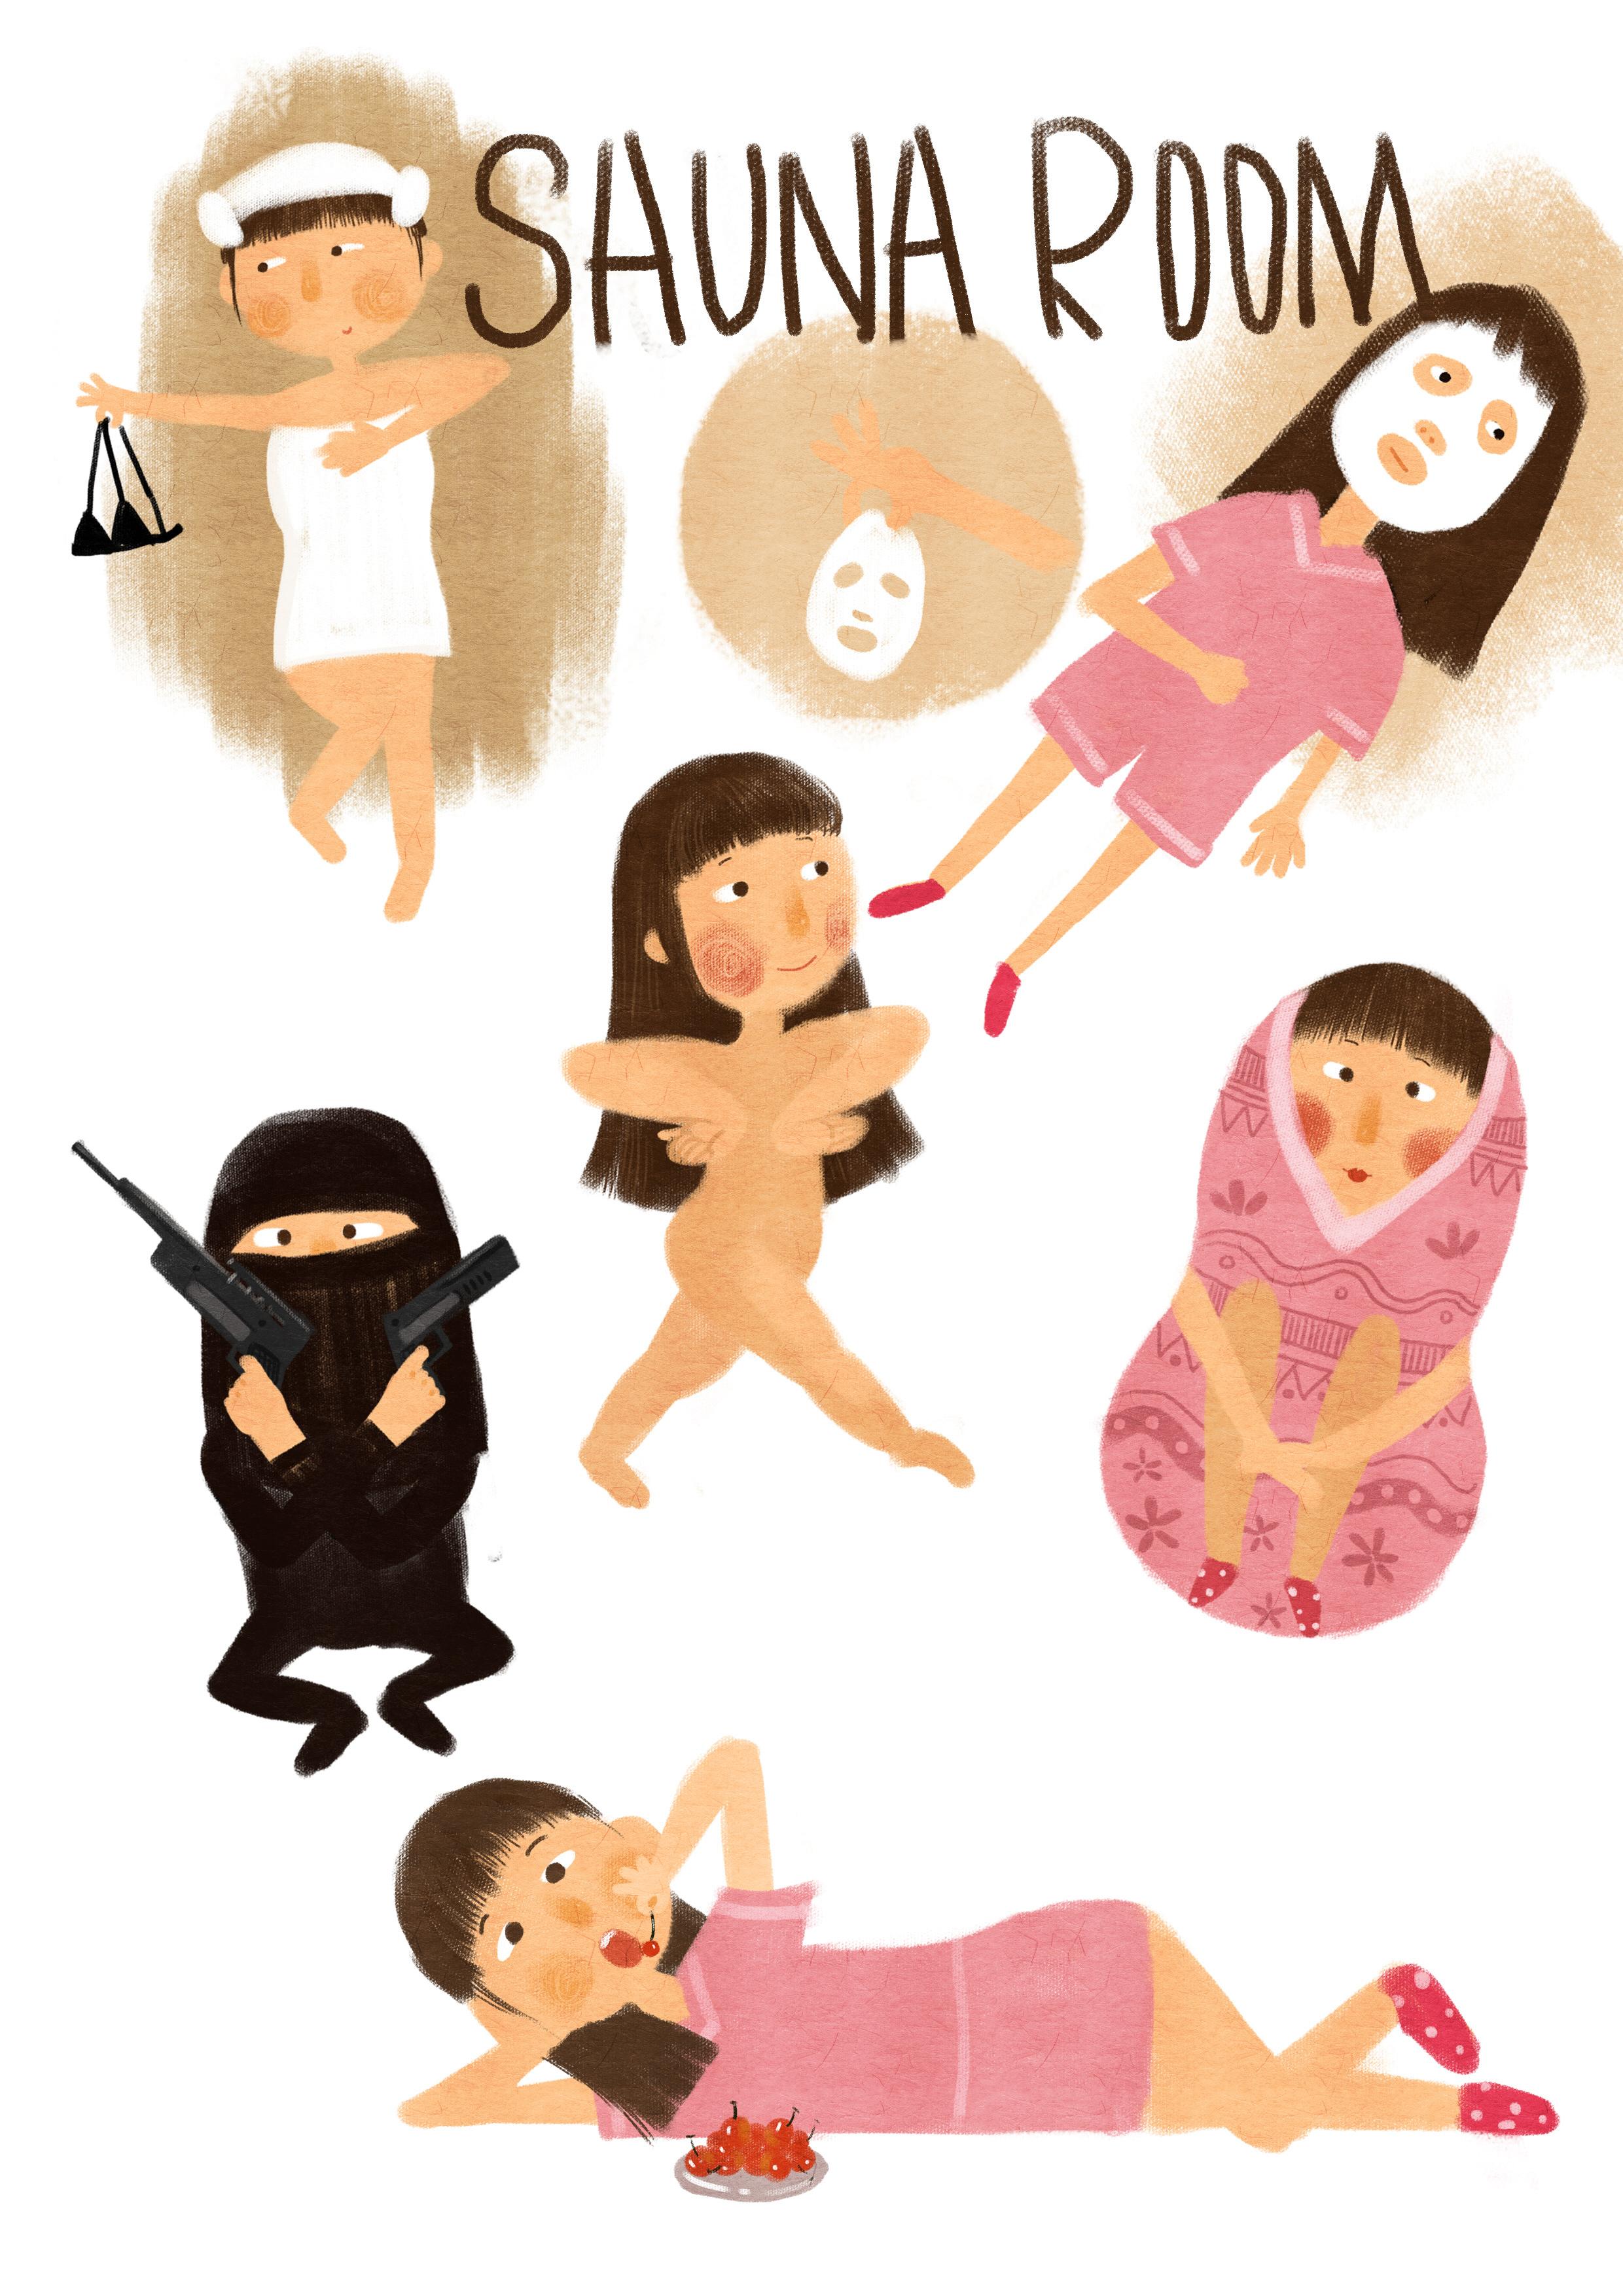 动漫手绘一系列